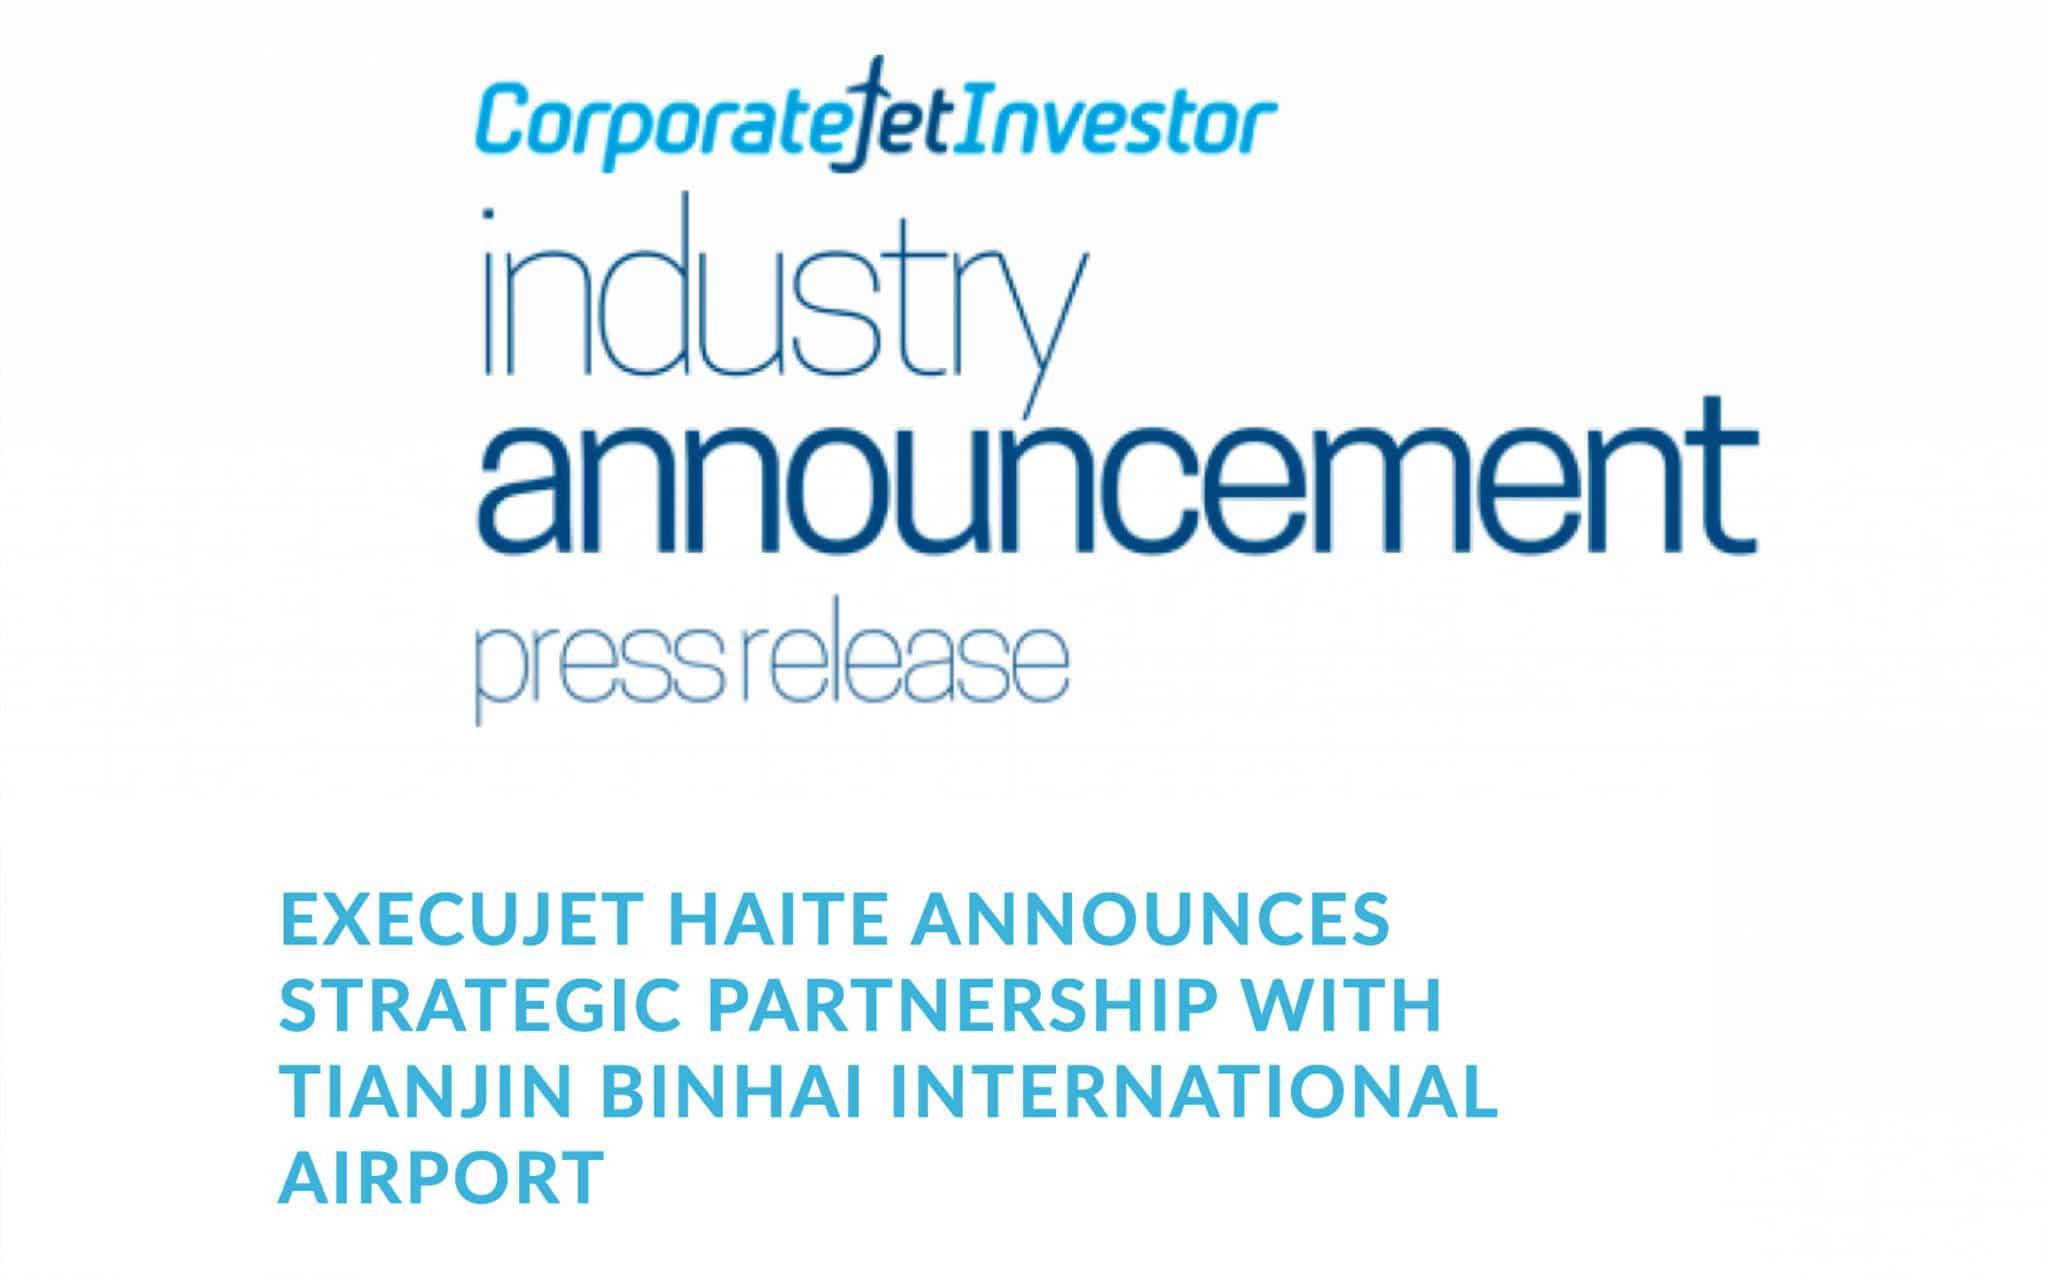 April 2018 - CJI - ExecuJet Haite announces strategic partnership with Tianjin Binhai International Airport